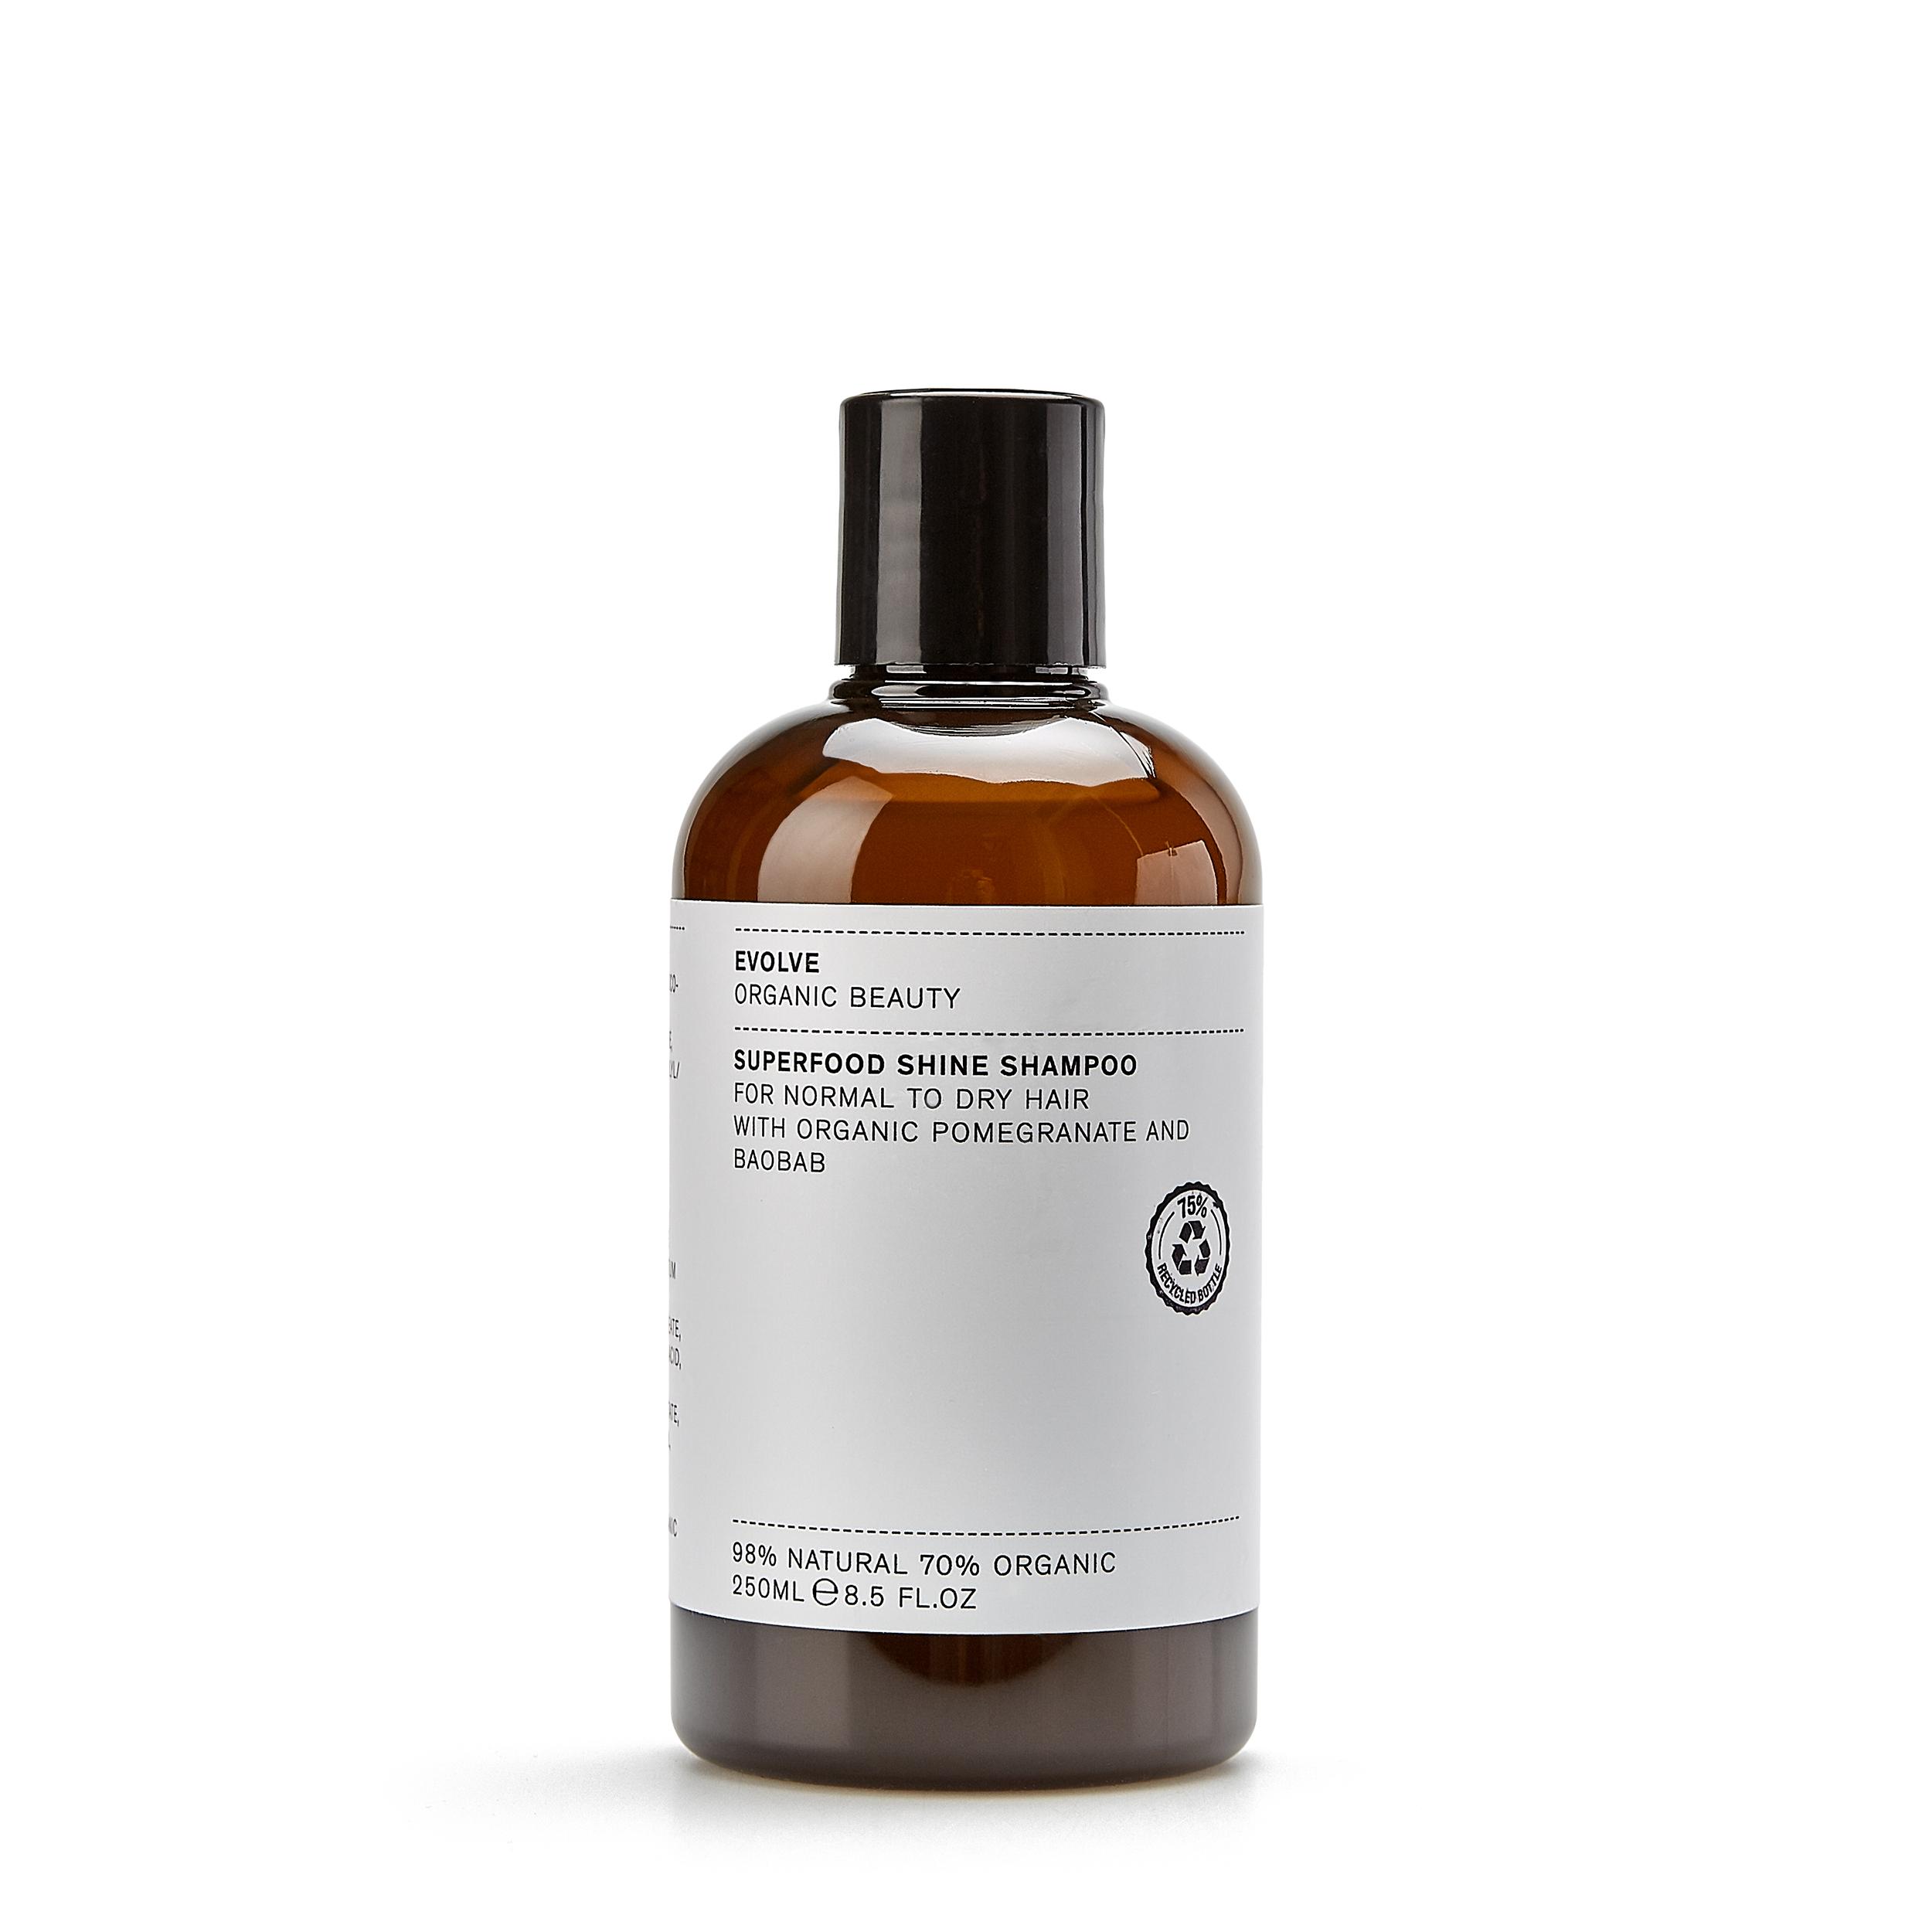 Evolve Organic Beauty Шампунь «Superfood Shine Shampoo» 250 мл фото